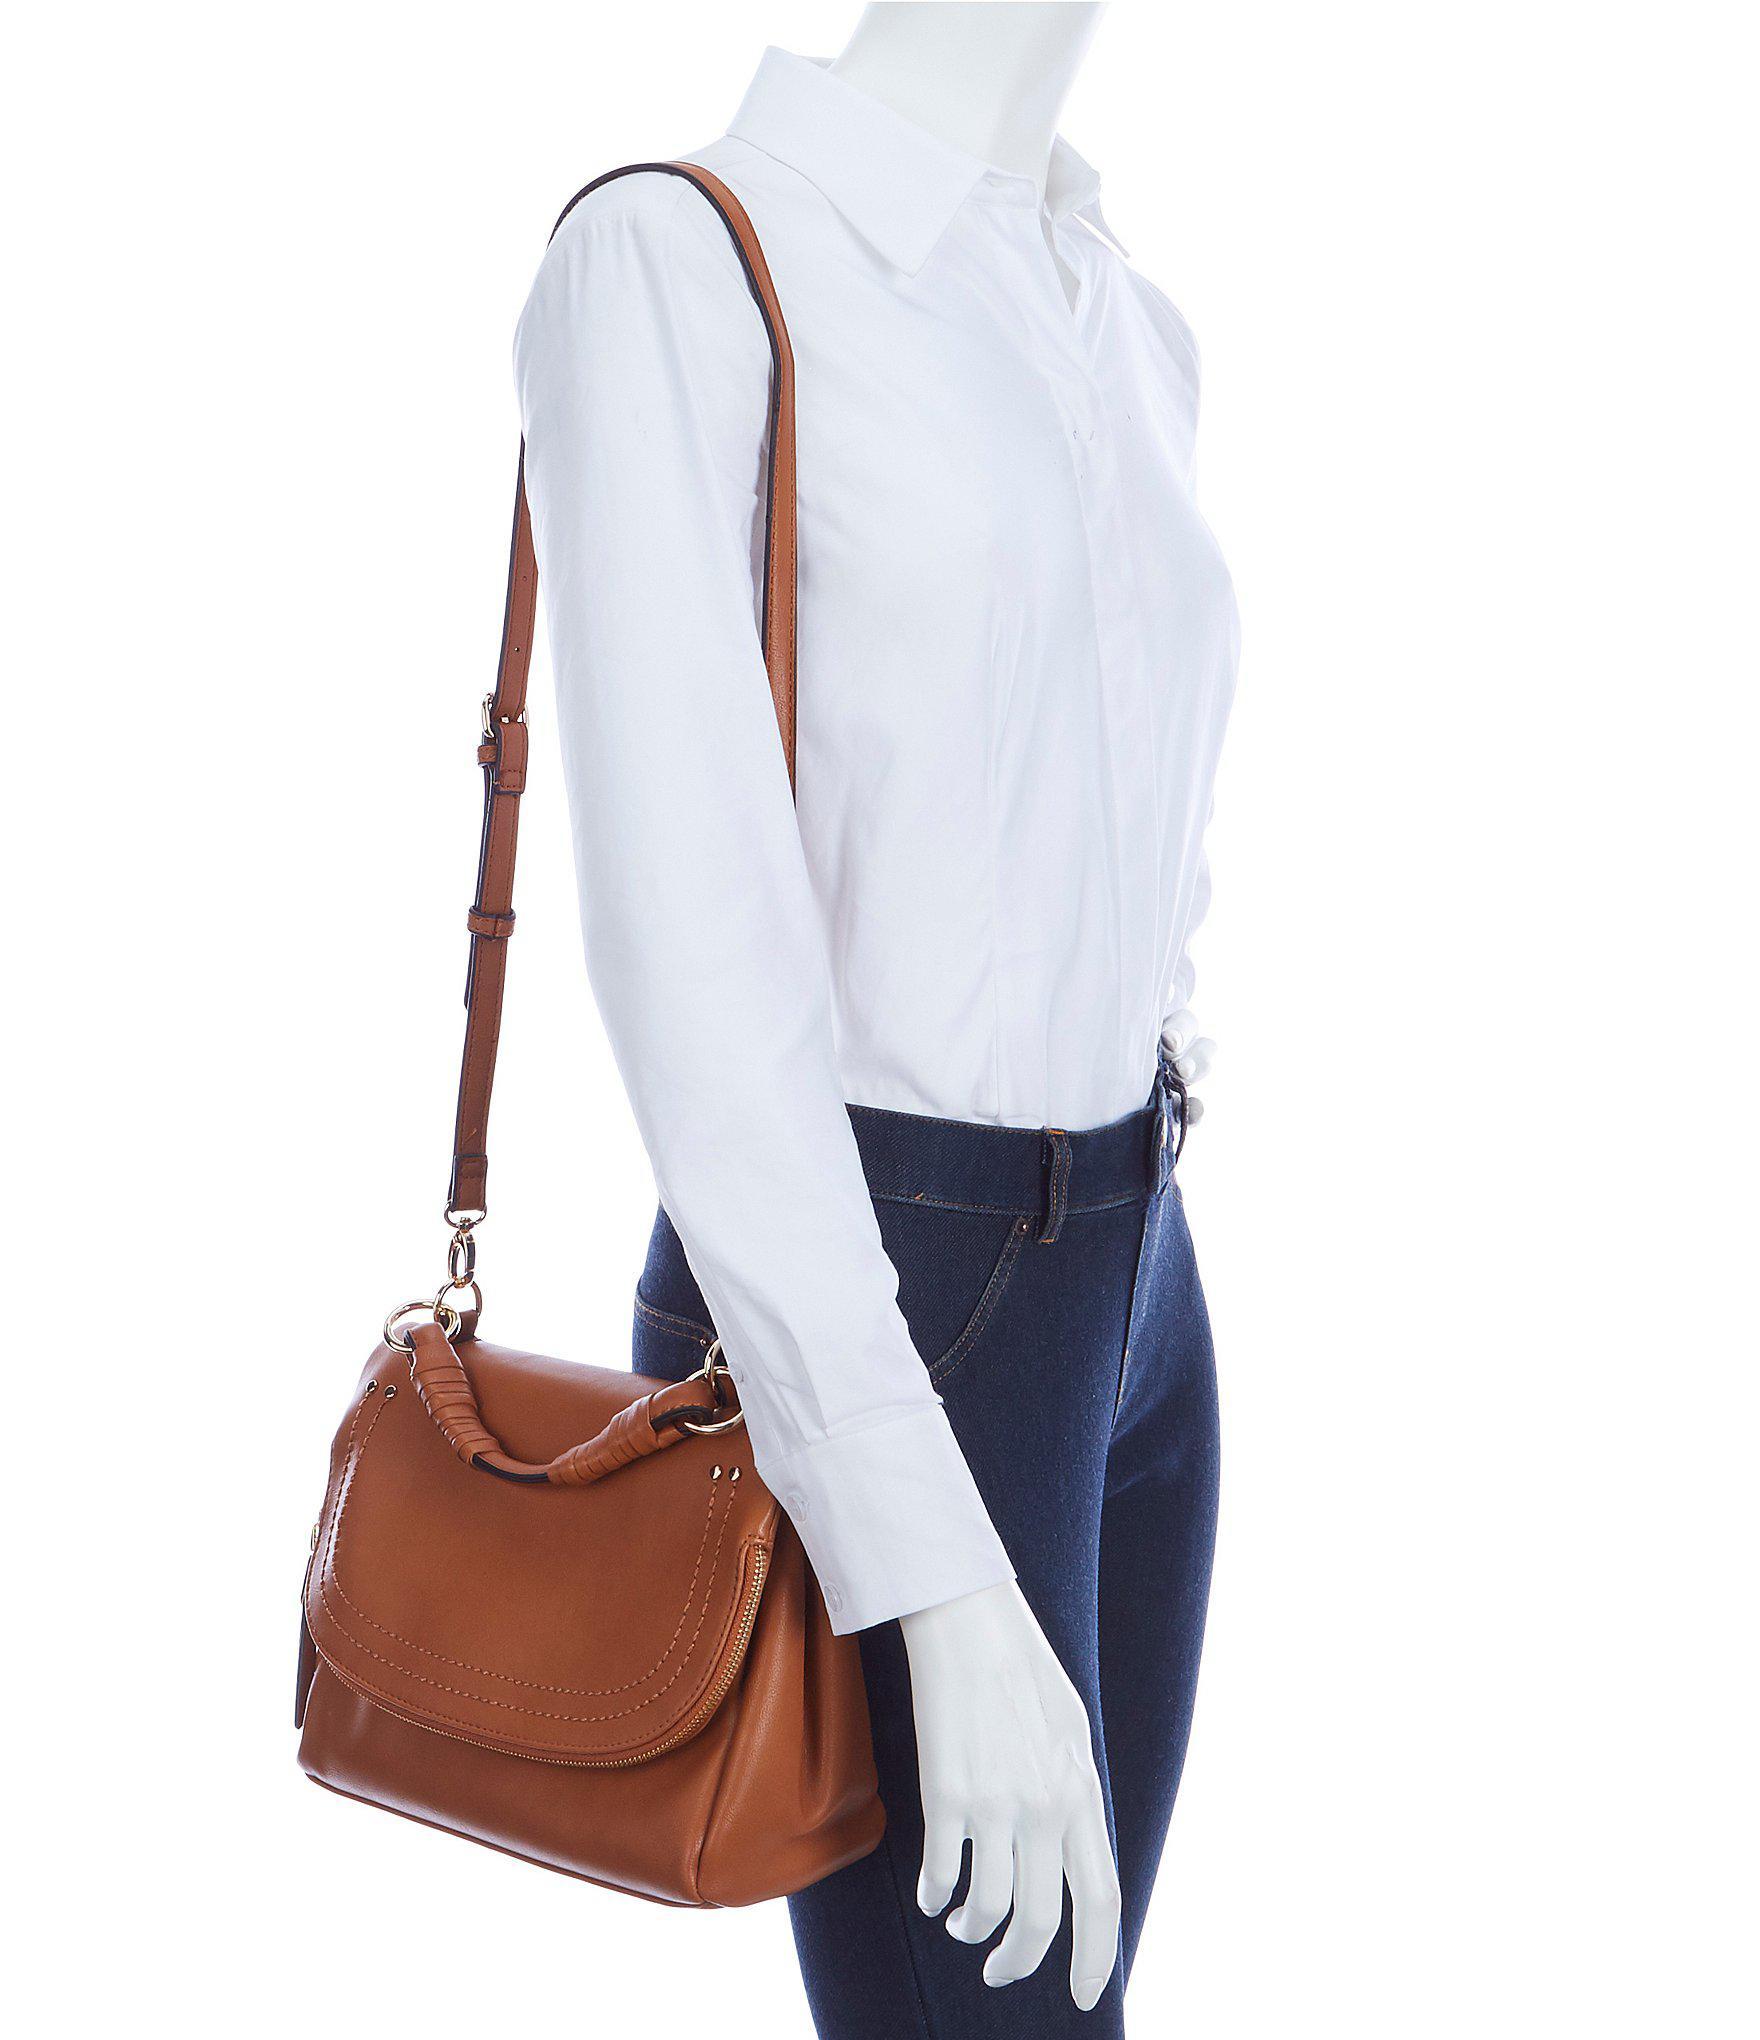 7533e69d7a Sole Society Rubie Zipper Flap Cross-body Bag in Brown - Lyst